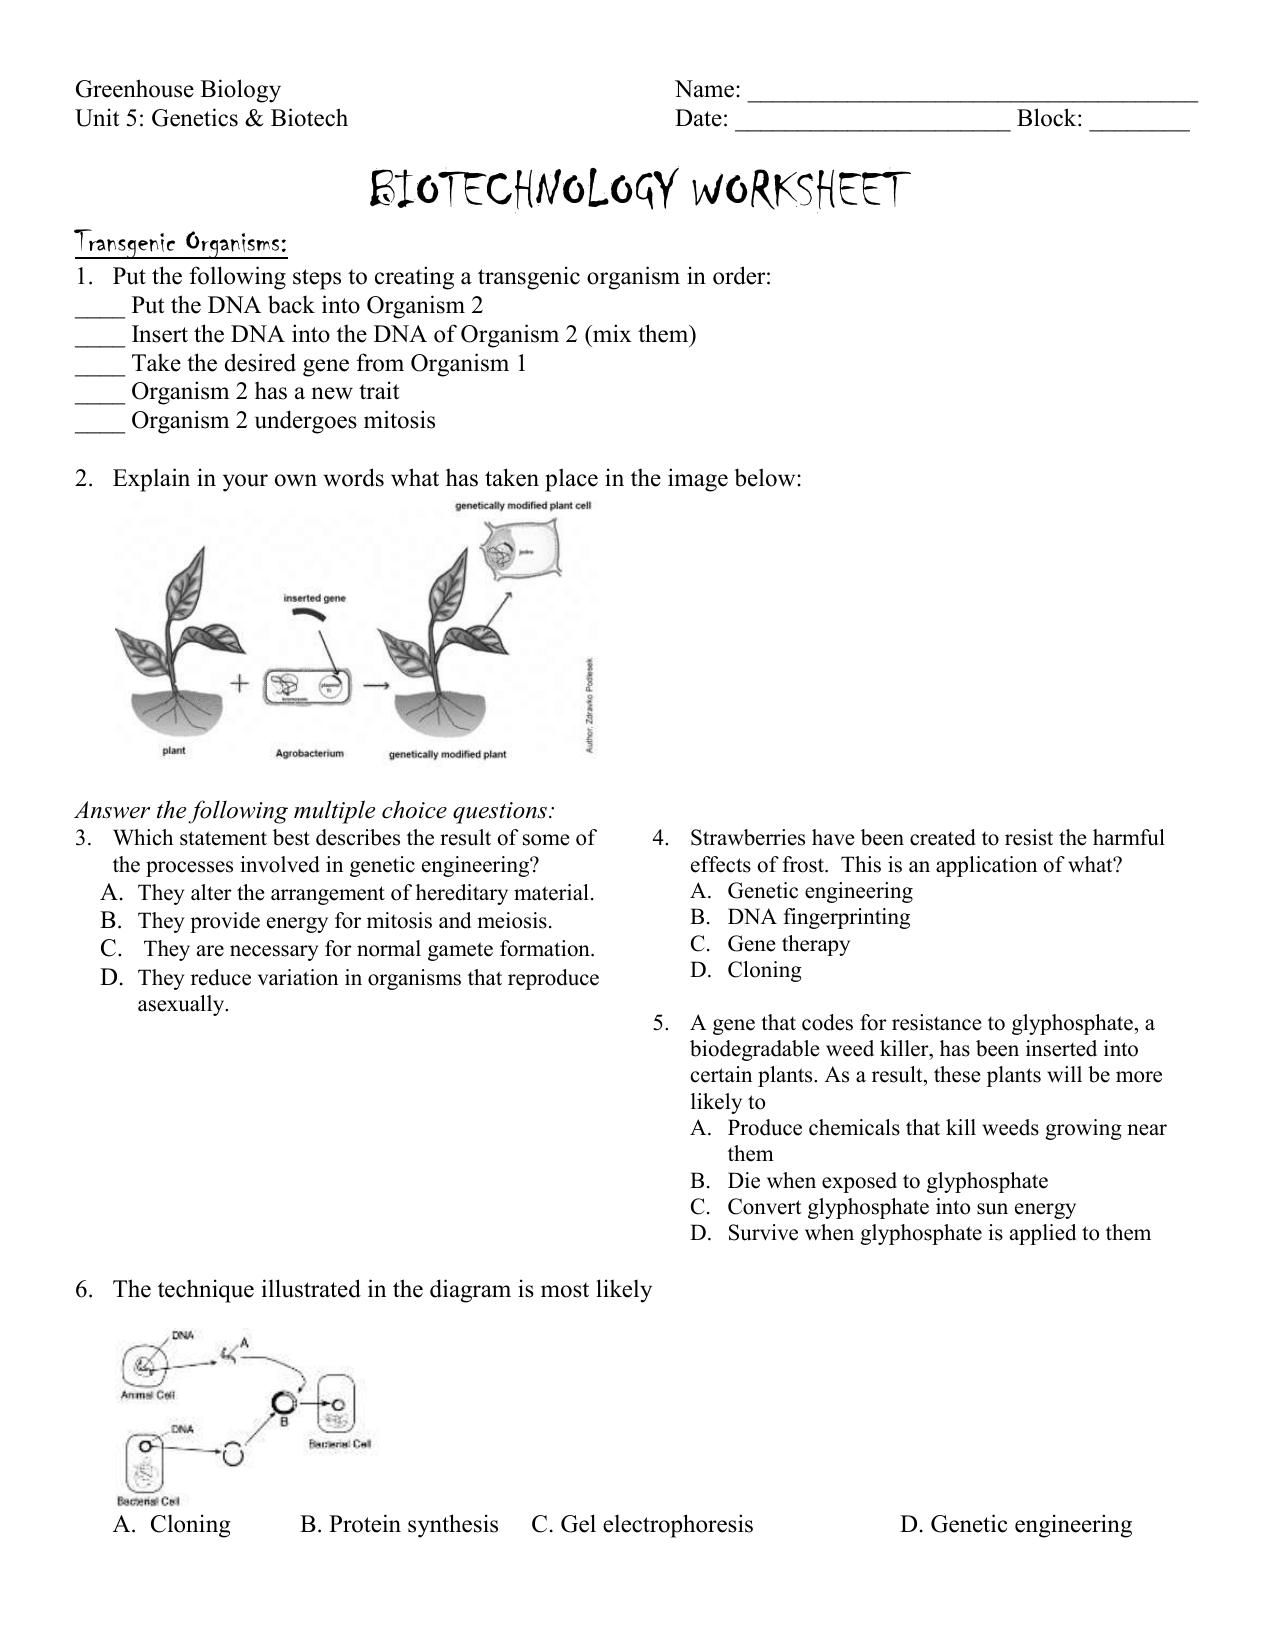 Biotechnology Worksheet